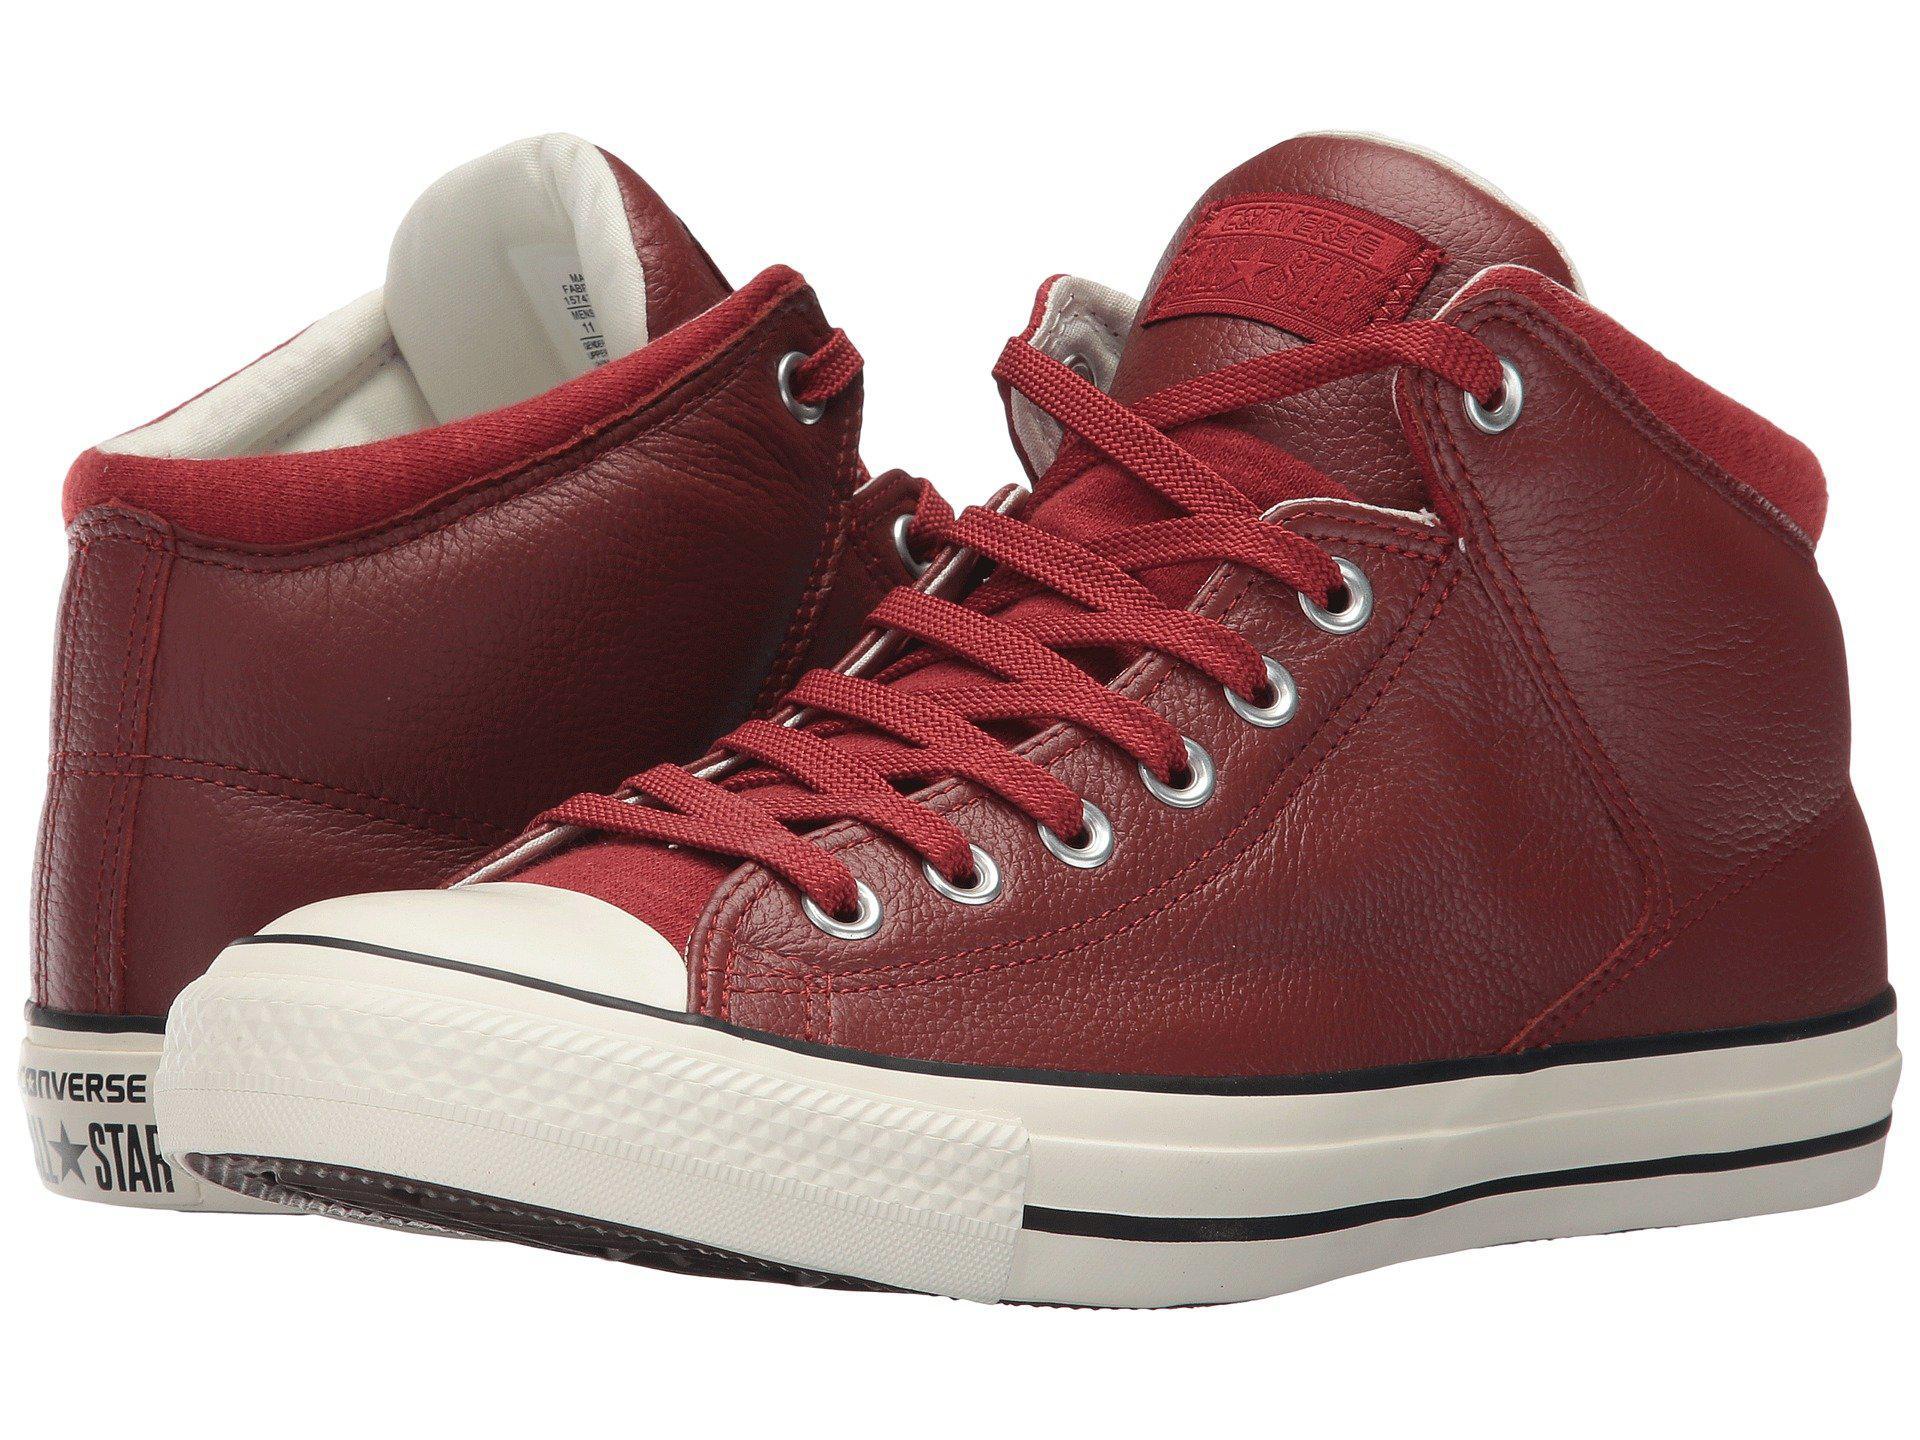 Lyst - Converse Chuck Taylor All Star Street Hi - Tumbled Leather in ... b92cc9cab